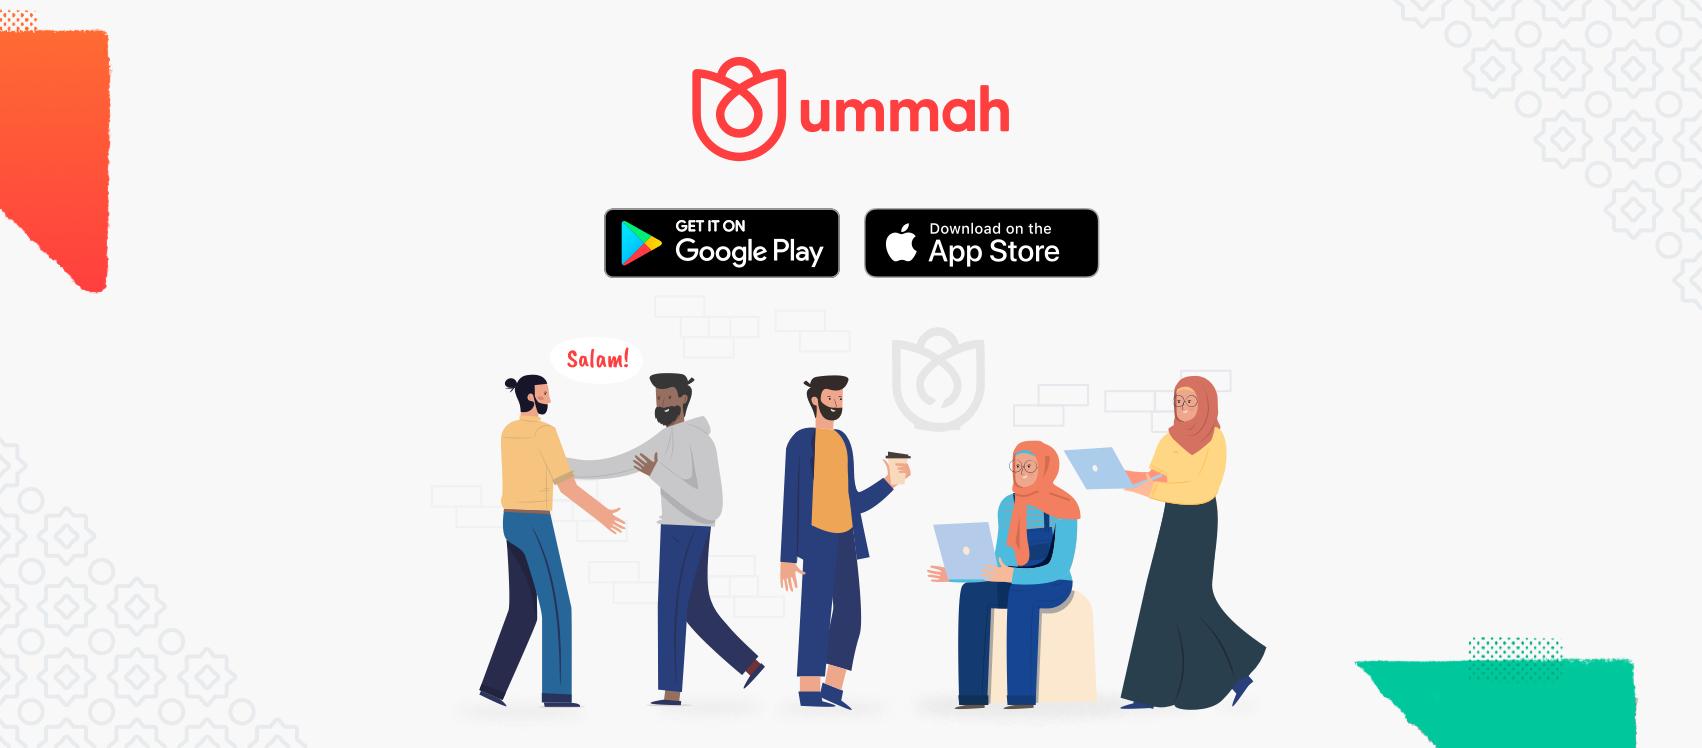 Muslim prayer times, islamic prayer times - Ummah - Muslims